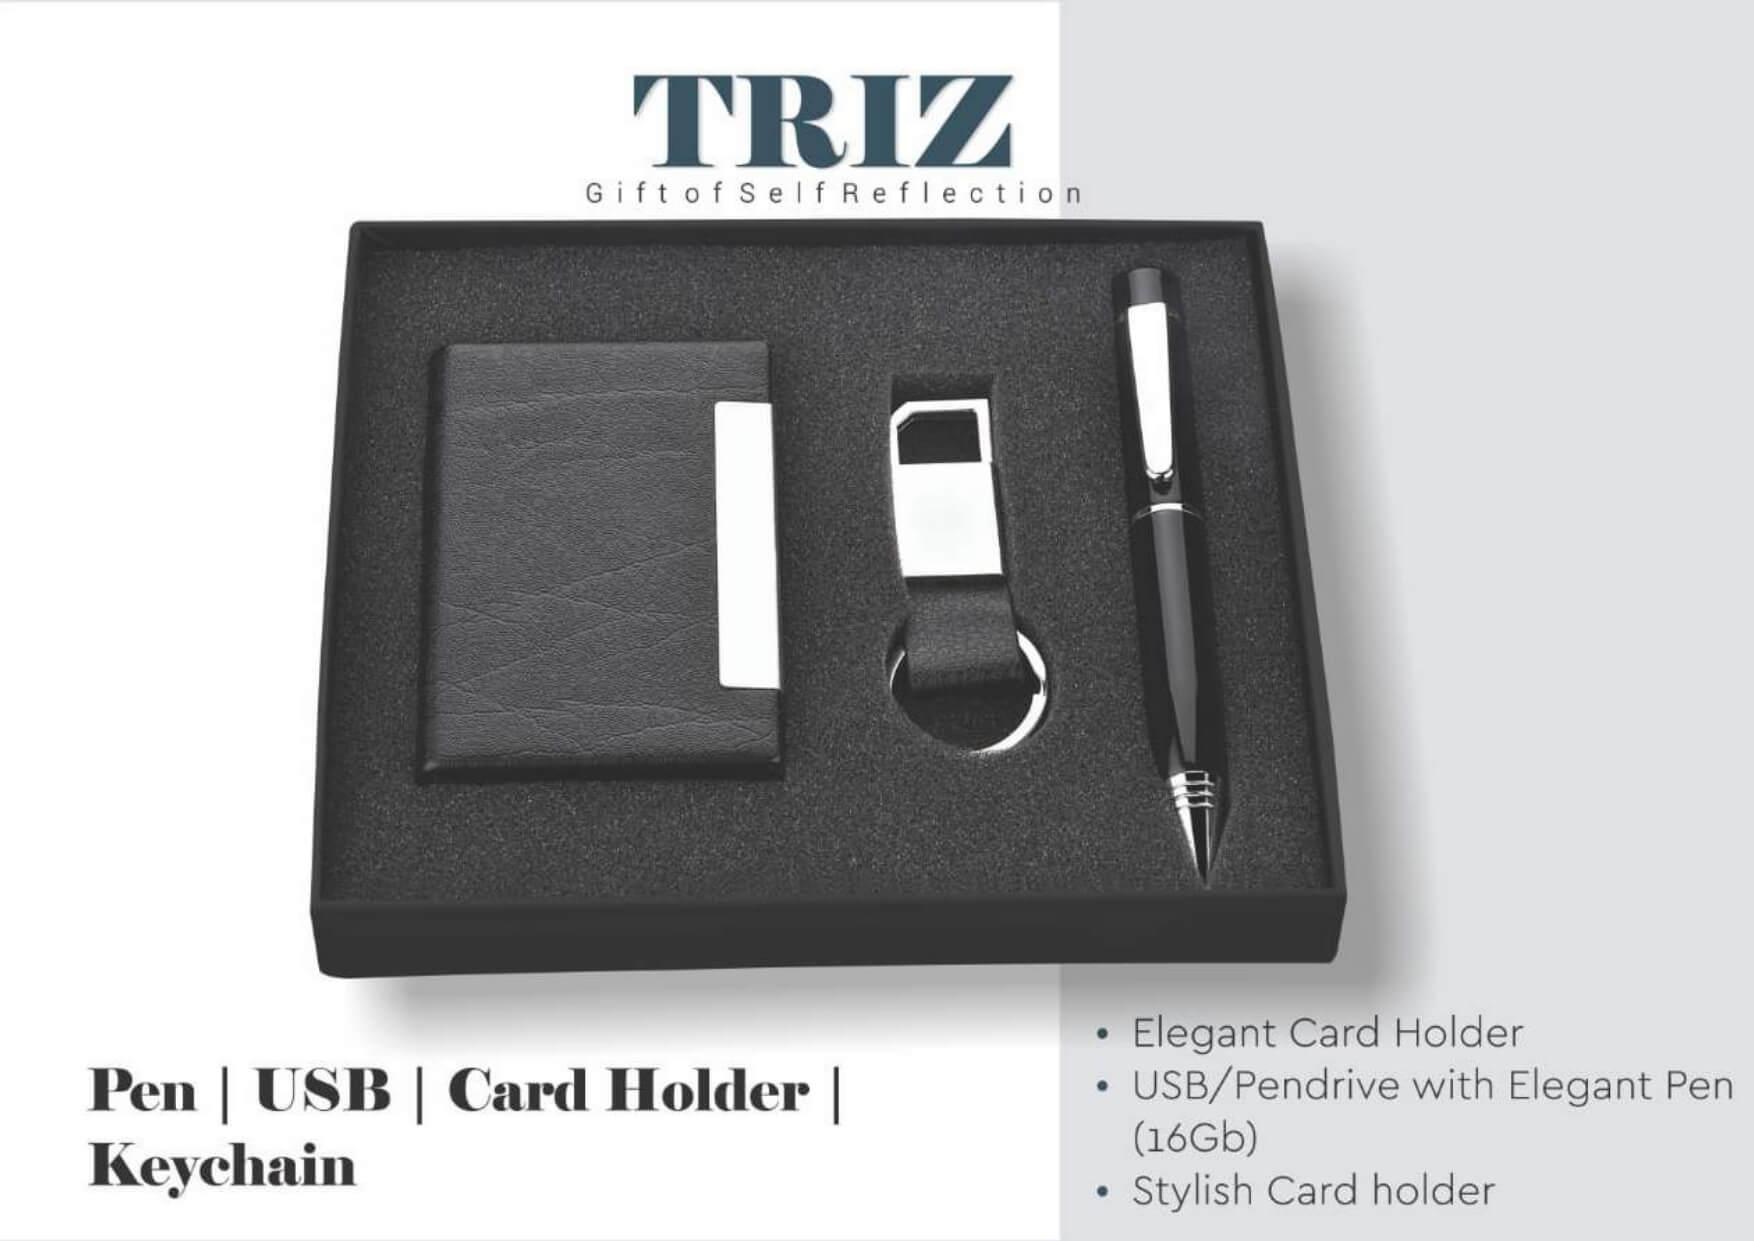 Pen with Usb , Card Holder, Keychain Set Triz